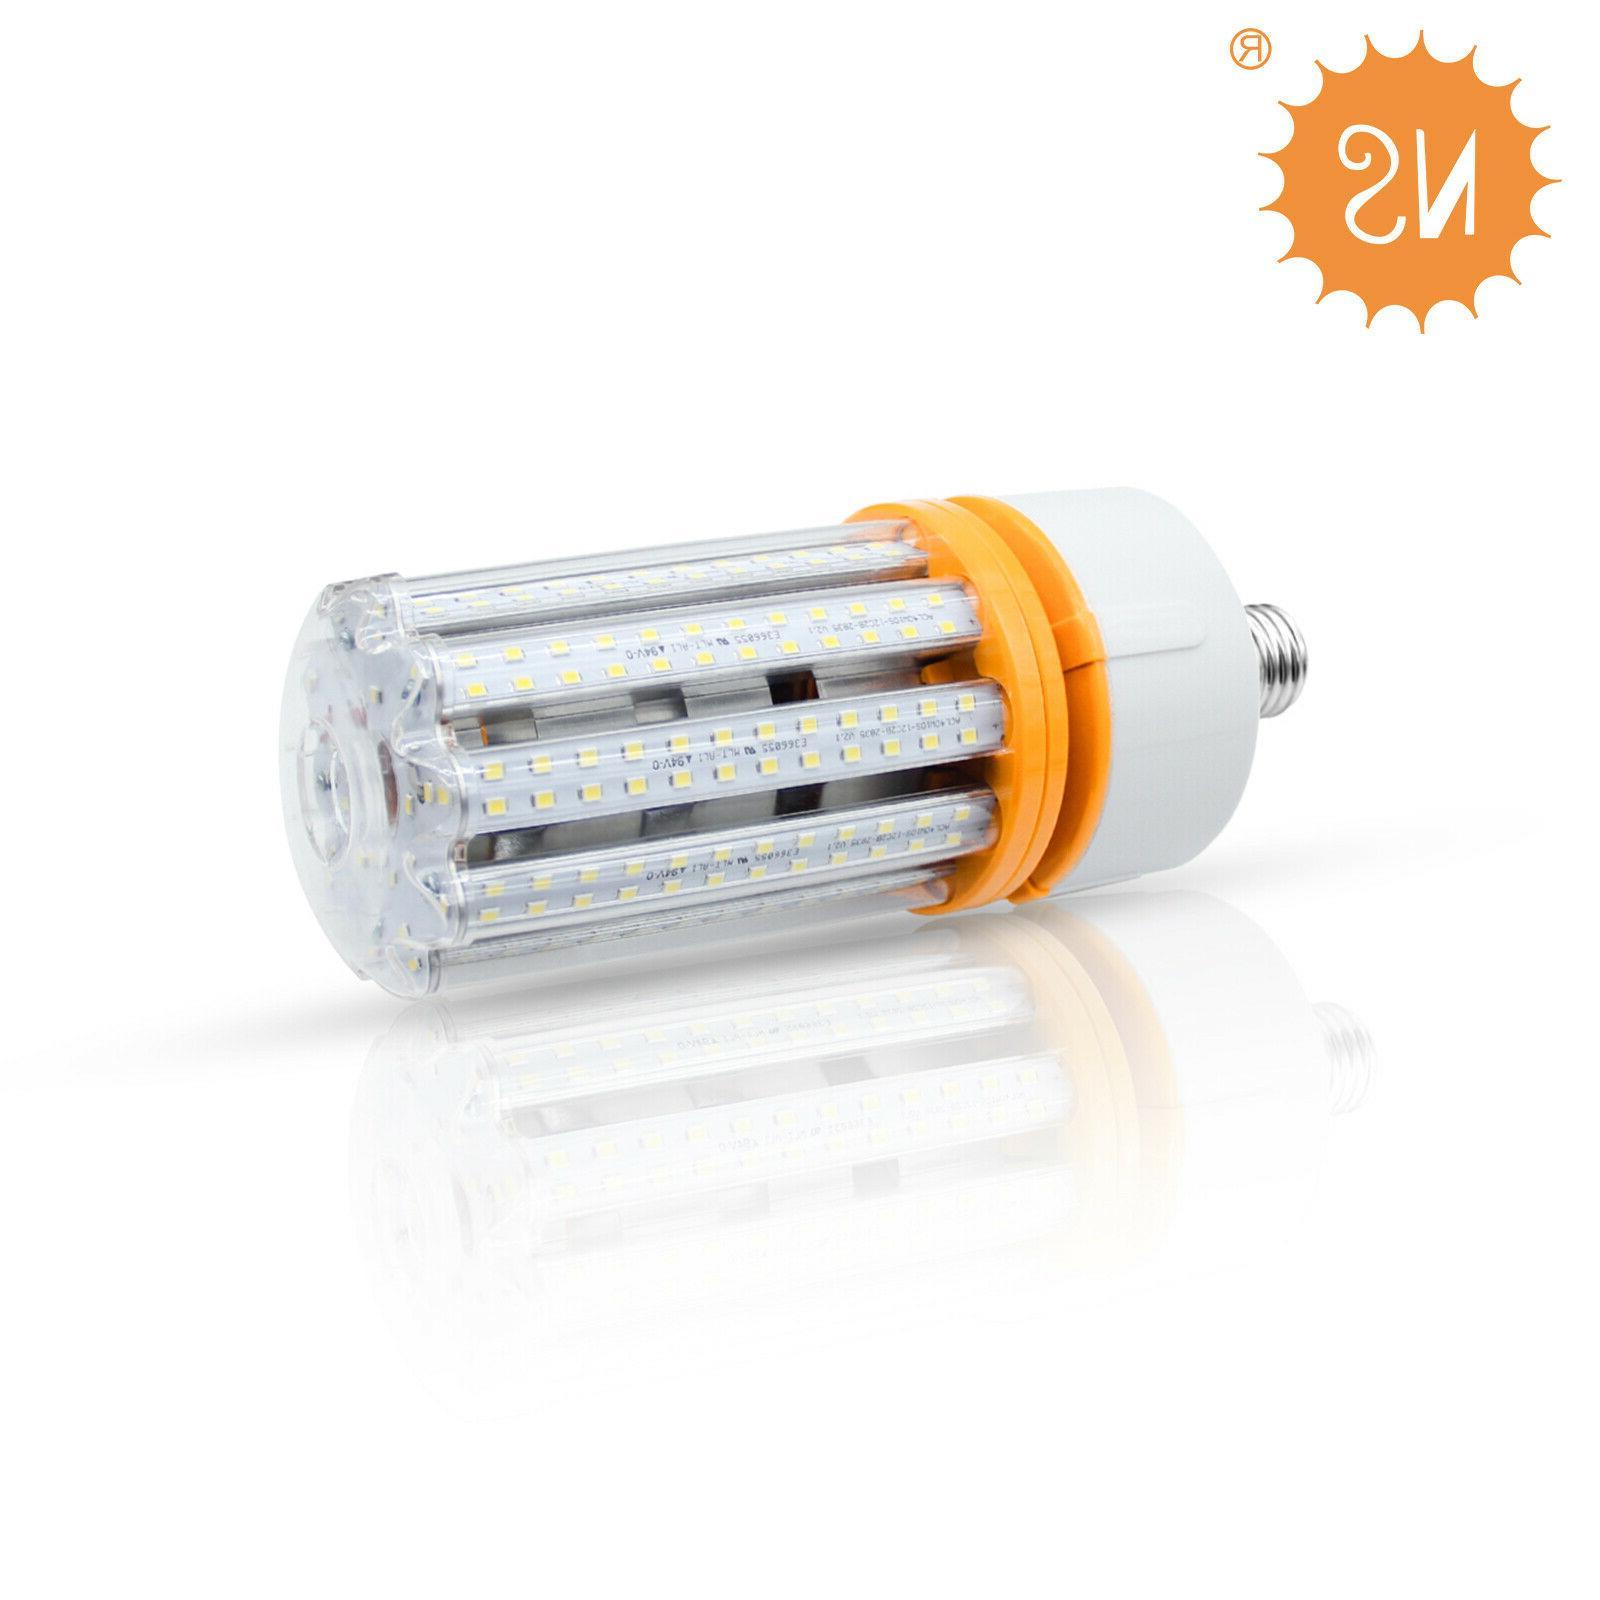 NS Corn Light Bulb Eq. Replacement Lamp White 3000K